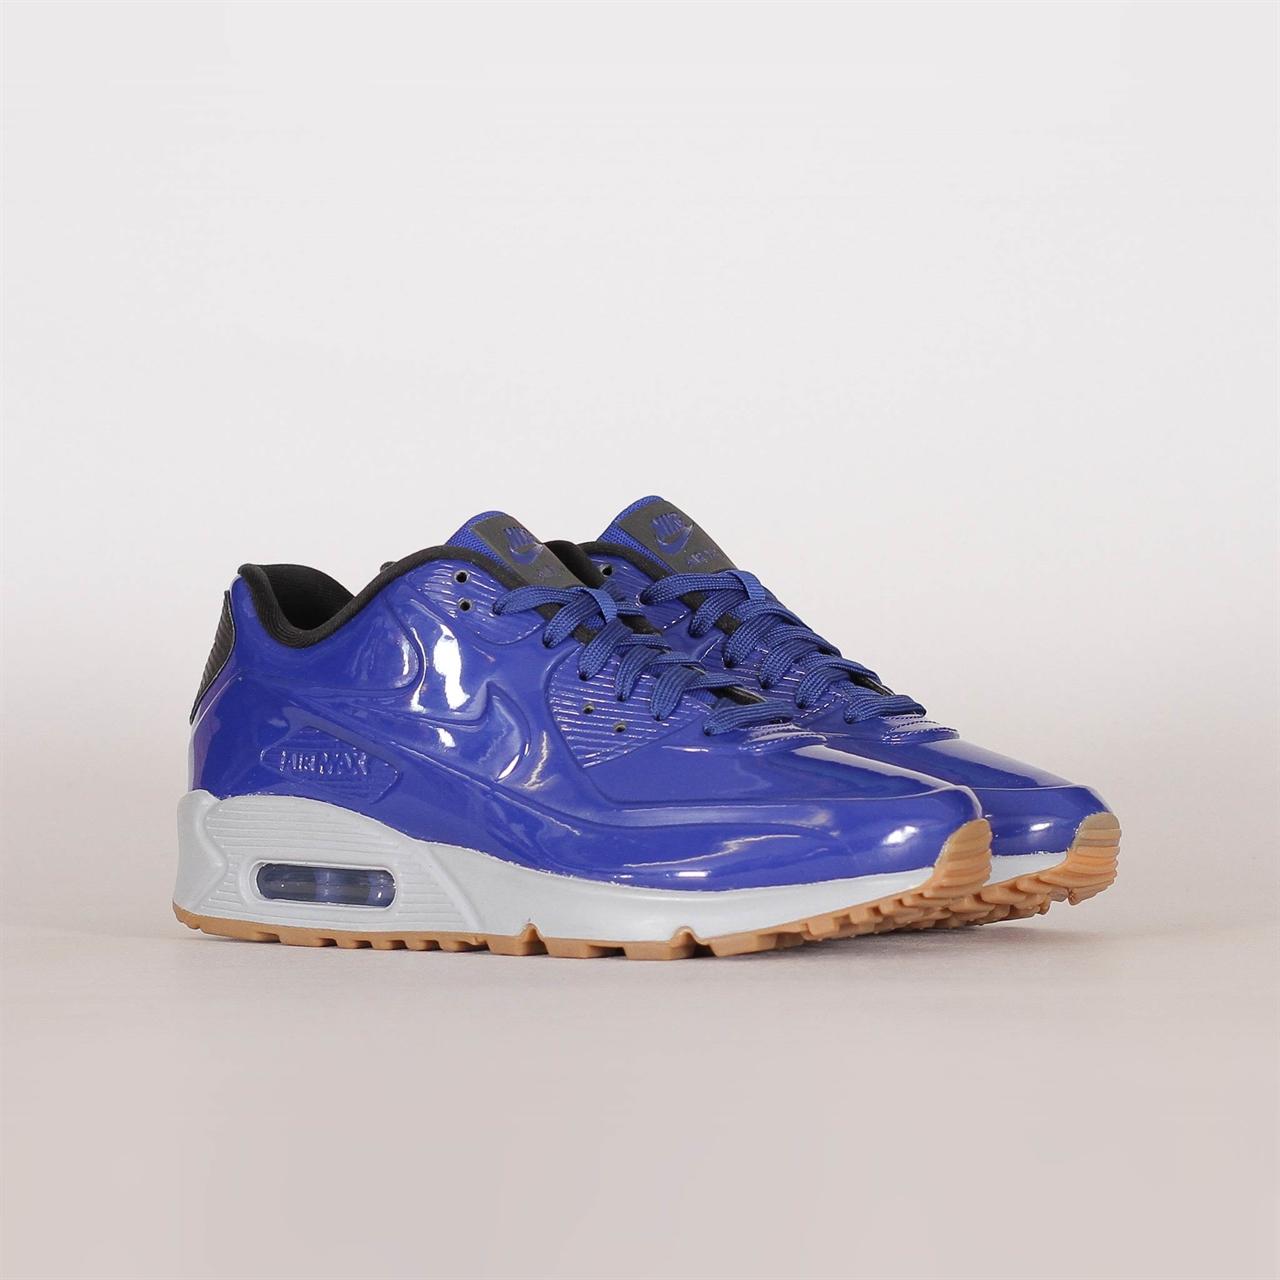 low priced 99a20 584ef nike sportswear air max 90 vt quickstrike 831114 400